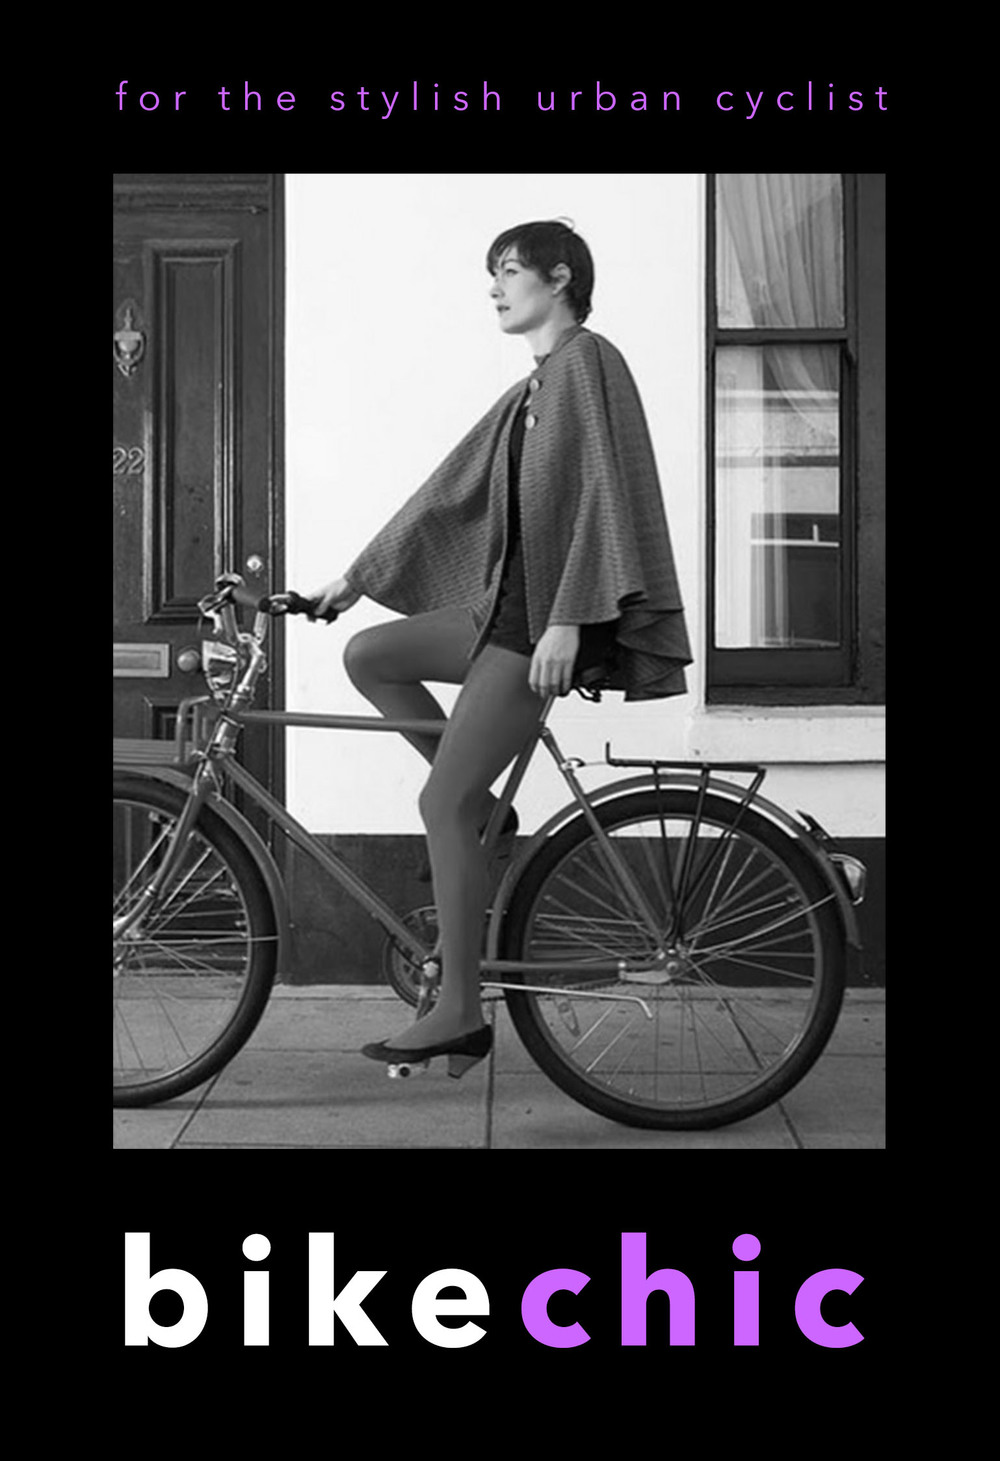 BikeChicLogoPortrait.jpg